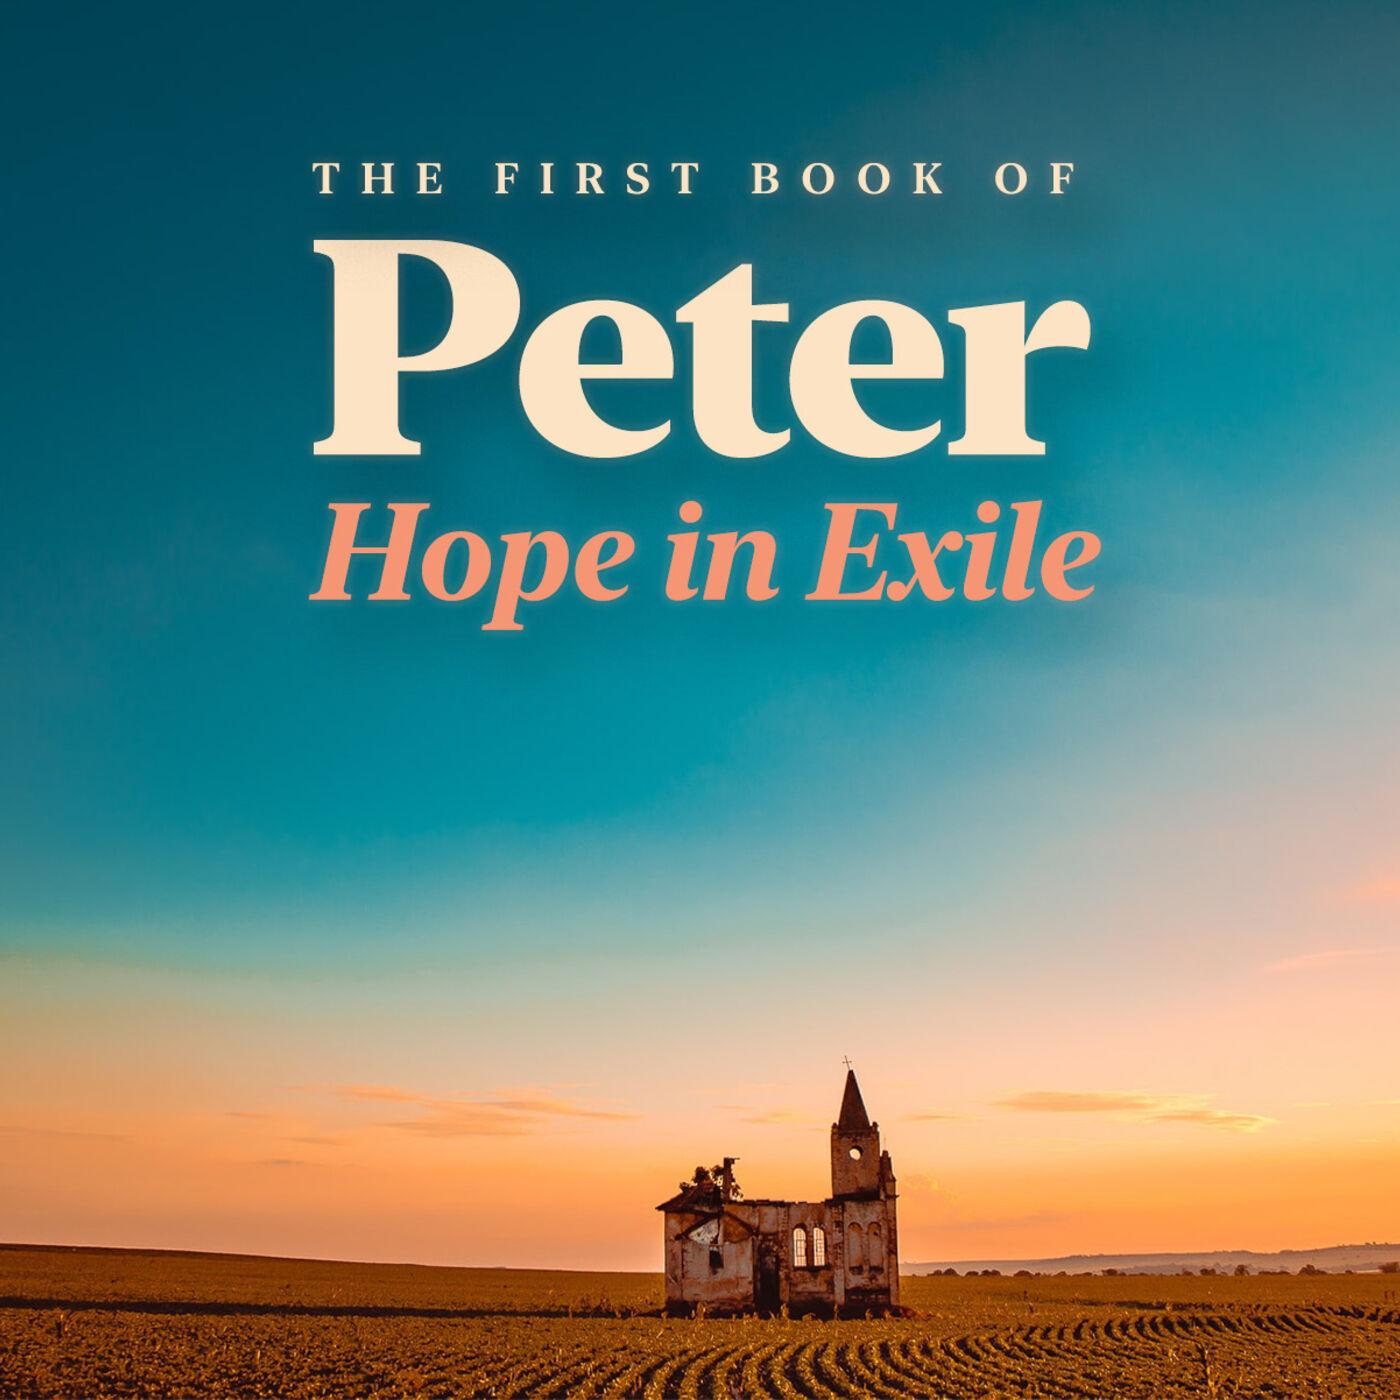 1 Peter 1:13-21 | Pastor Dale Stinson